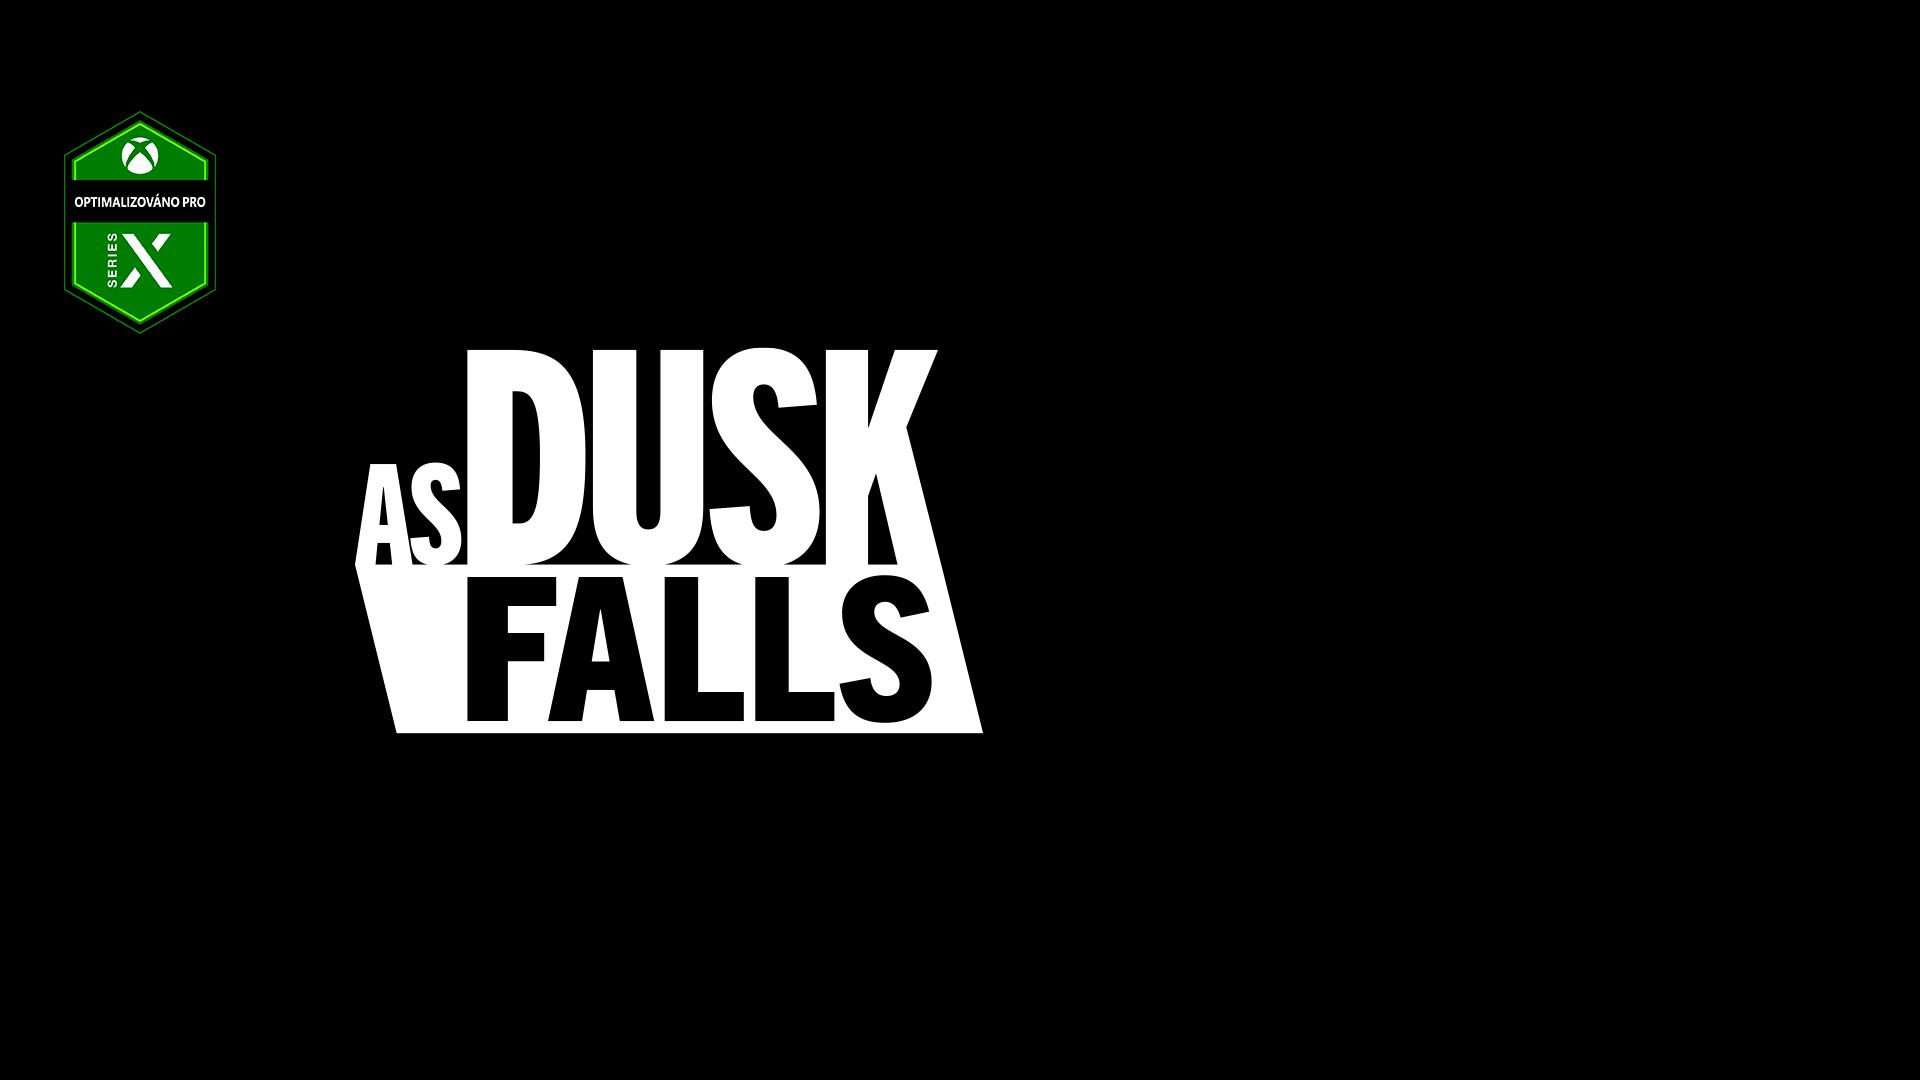 Logo Optimalizováno pro Series X, As Dusk Falls